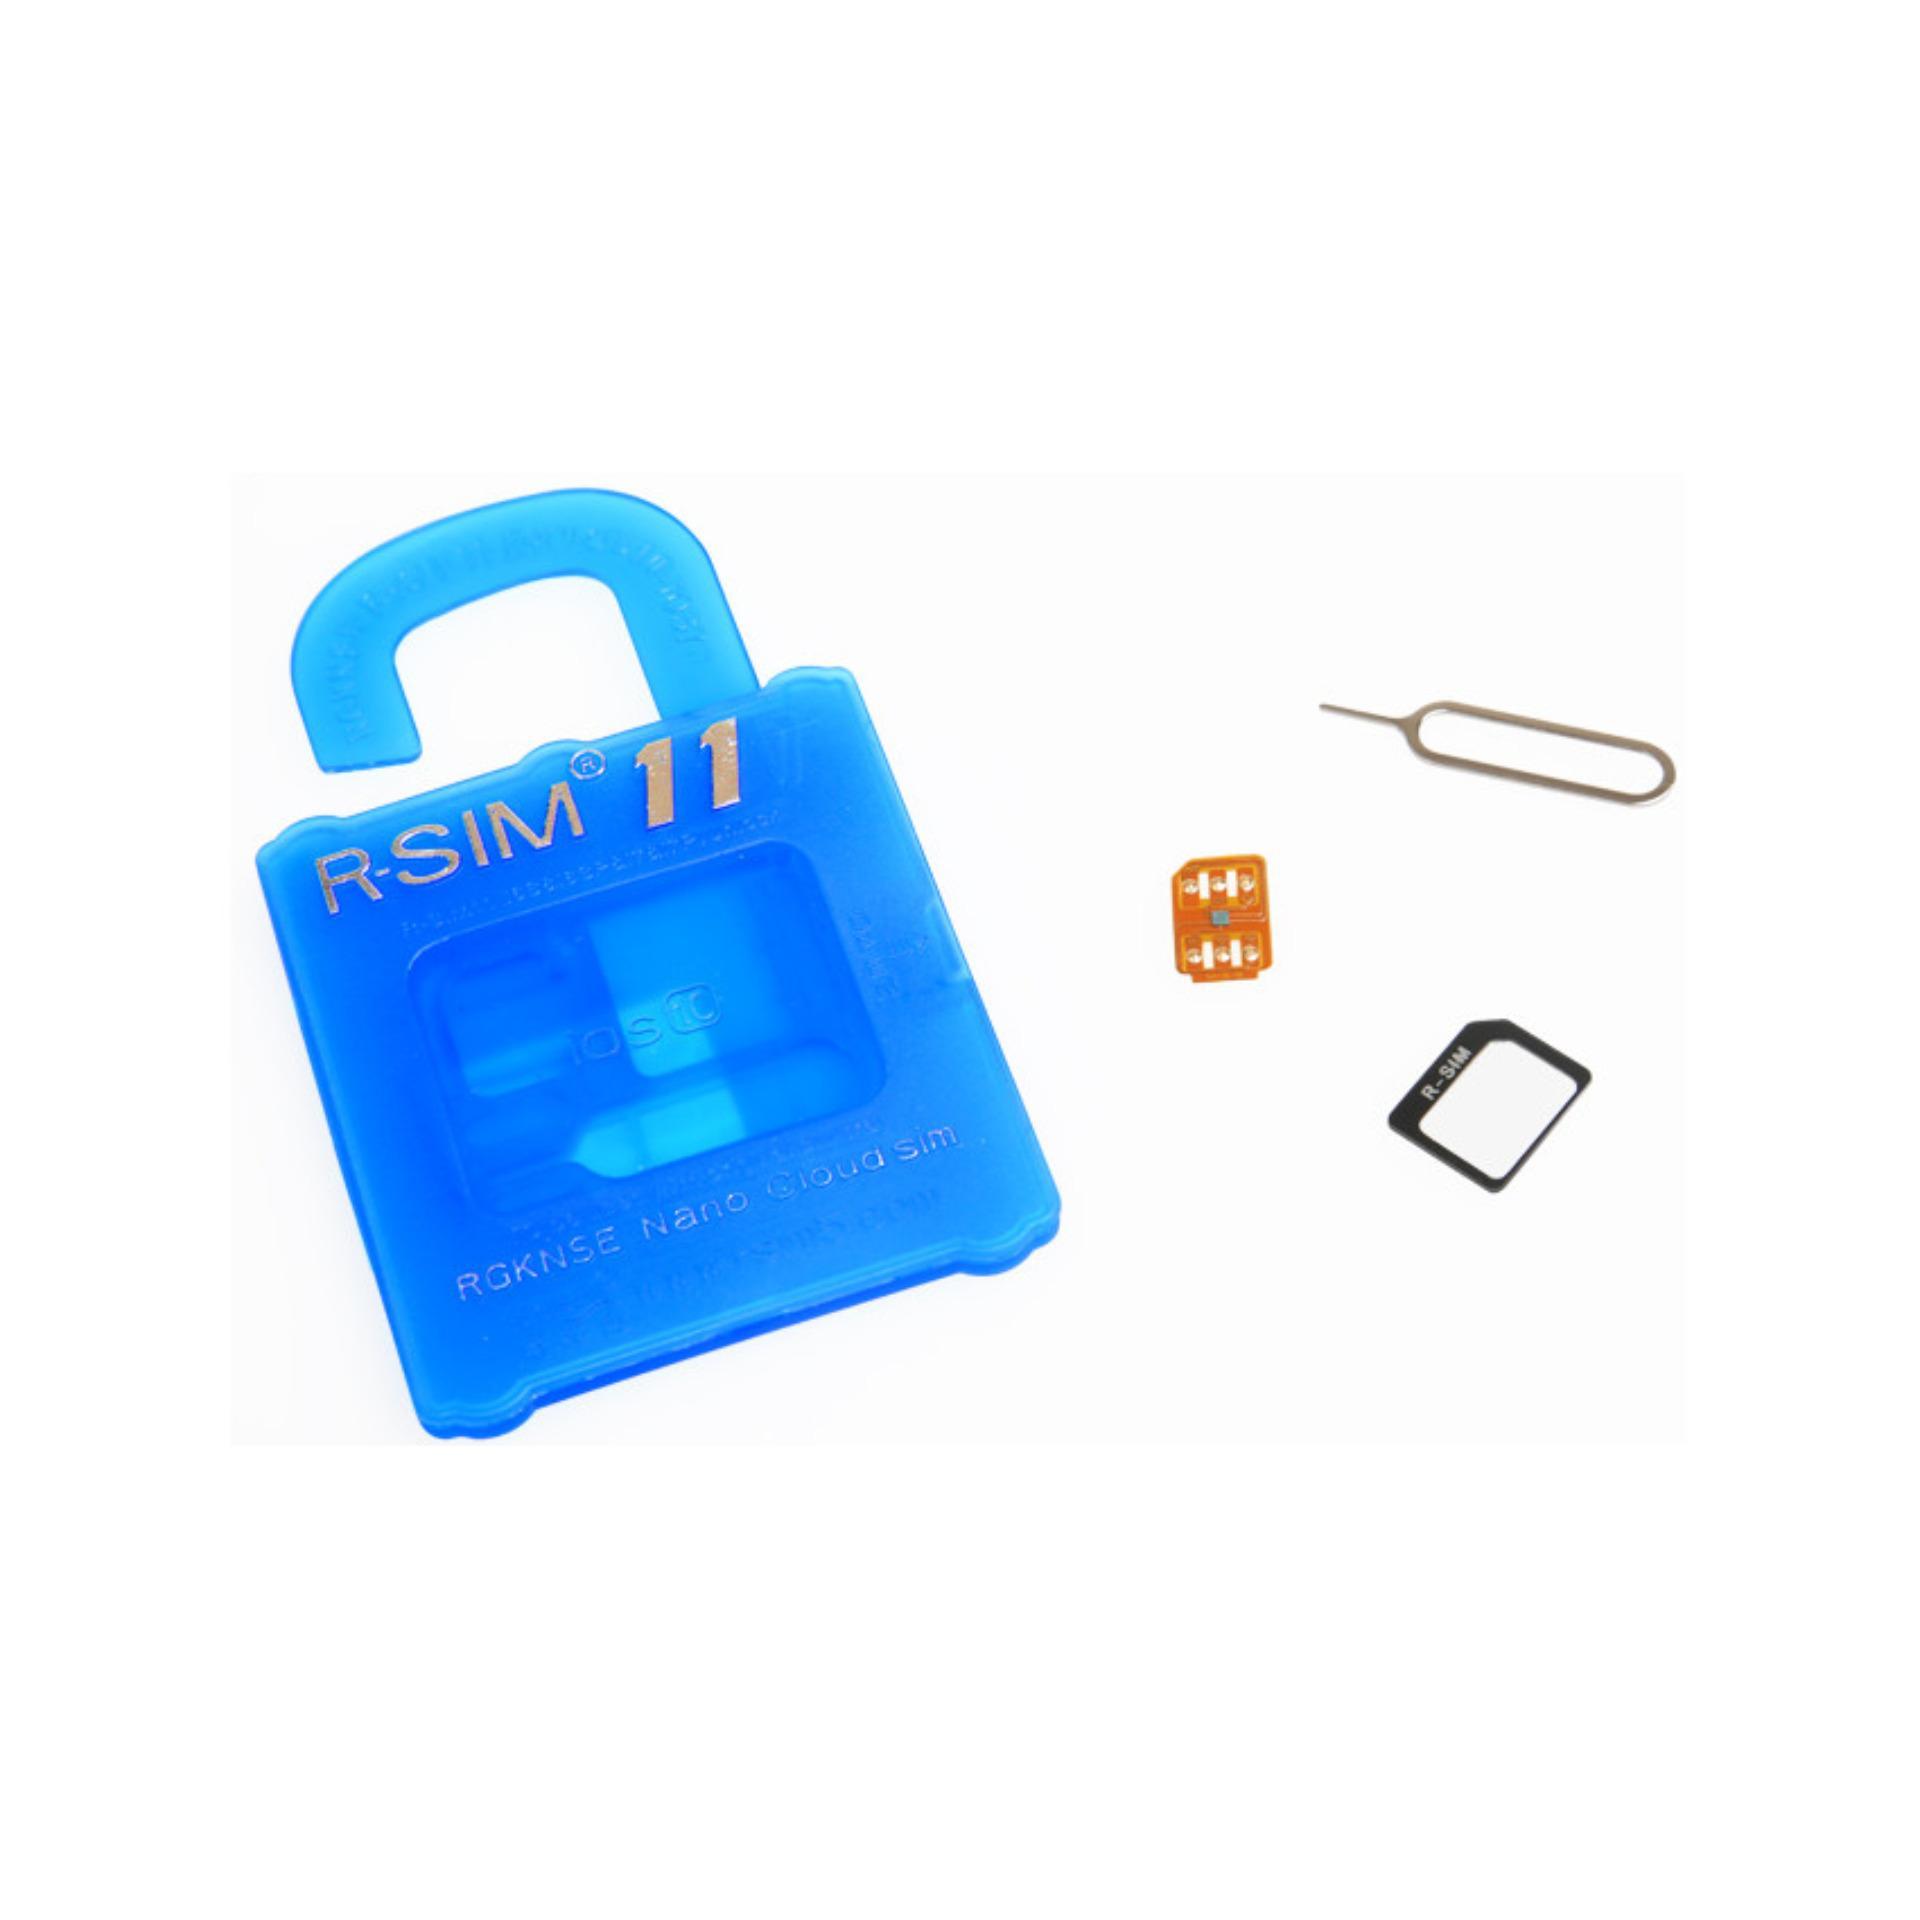 Rsim 11 Plus Iphone 4s 5 5s 5se 5c 6 6s Se 7 Ios 8 9 10 1112 Goguo V20 12 13 14 15 X Pro R Sim Heicard Xsim Unlock Lock Carrier Chip Untuk Su